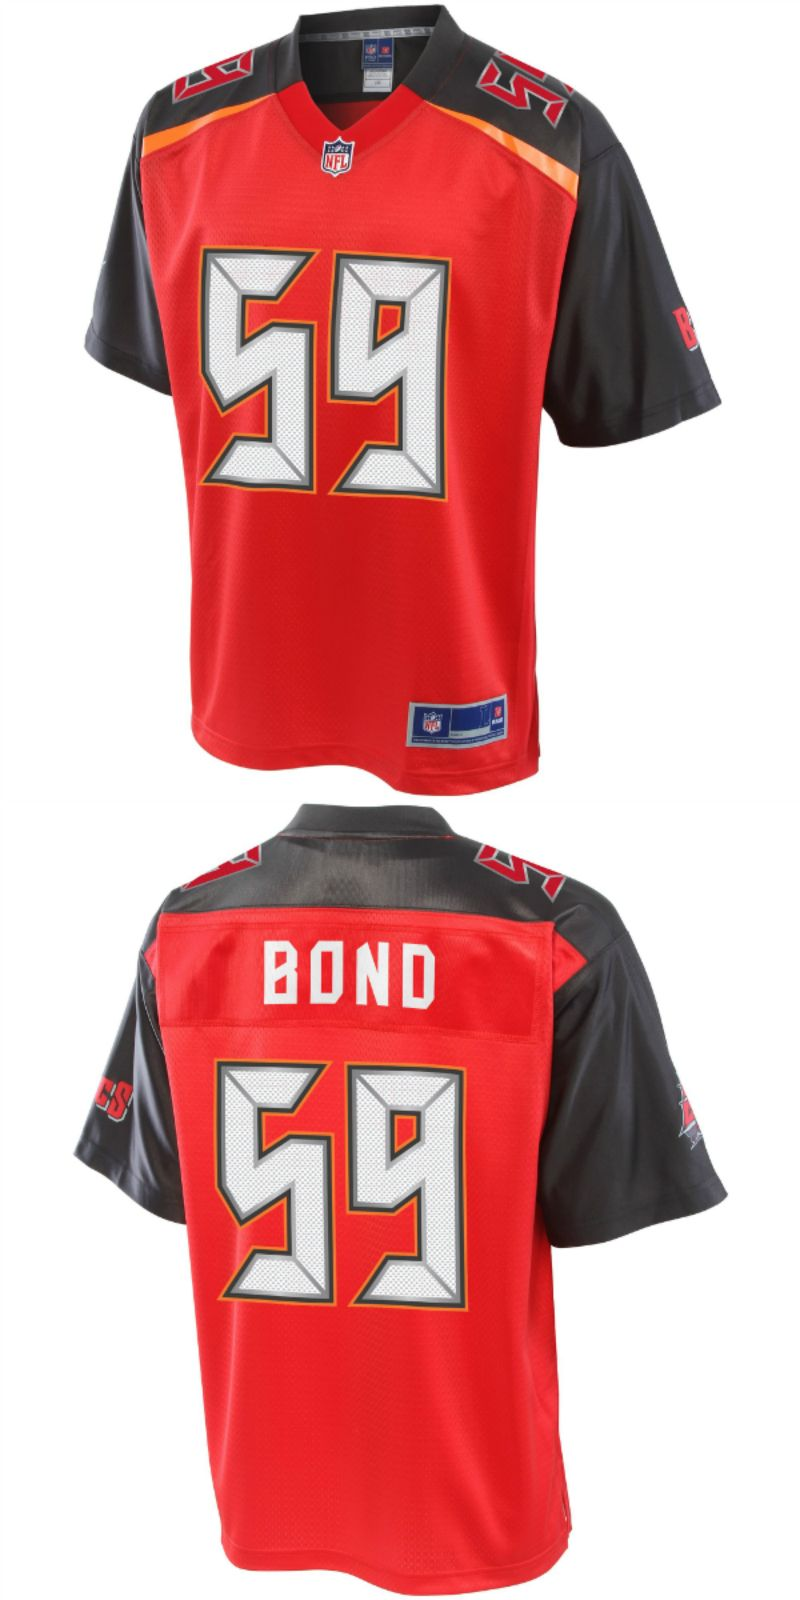 Up To 70 Off Devante Bond Tampa Bay Buccaneers Nfl Pro Line Player Jersey Red Tampa Bay Buccaneers Atlanta Falcons T Shirt Nfl Jerseys Tampa Bay Buccaneers